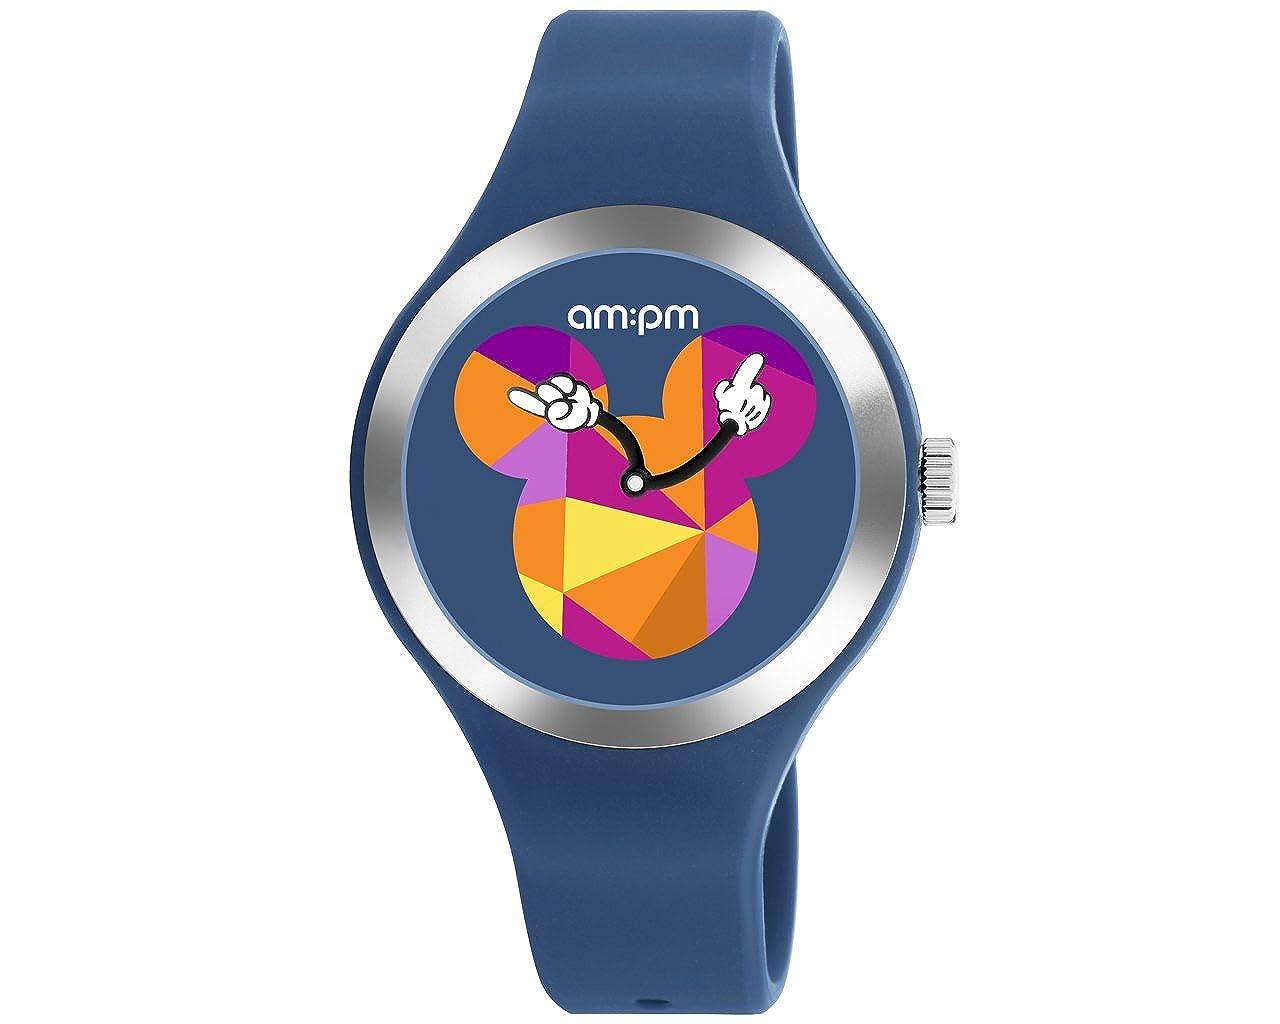 Amazon.com: Disney azul unisex reloj by AM: PM Multicolor ...